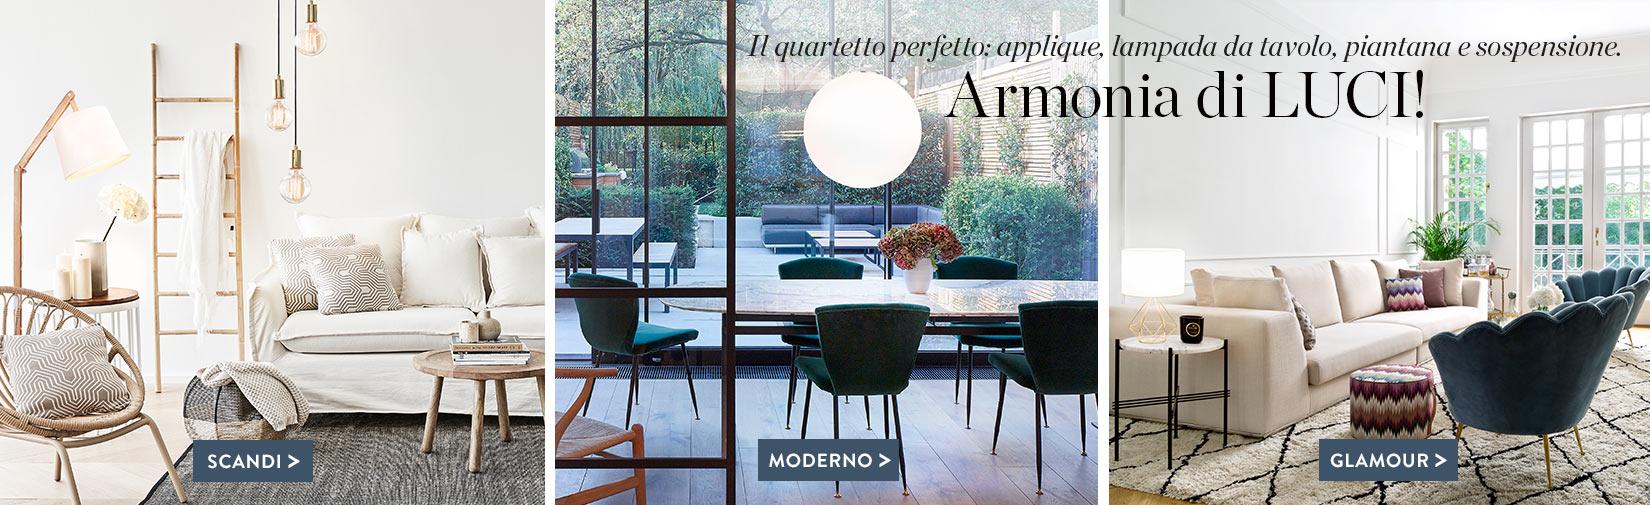 LP_Armonia_di_luci_desktop